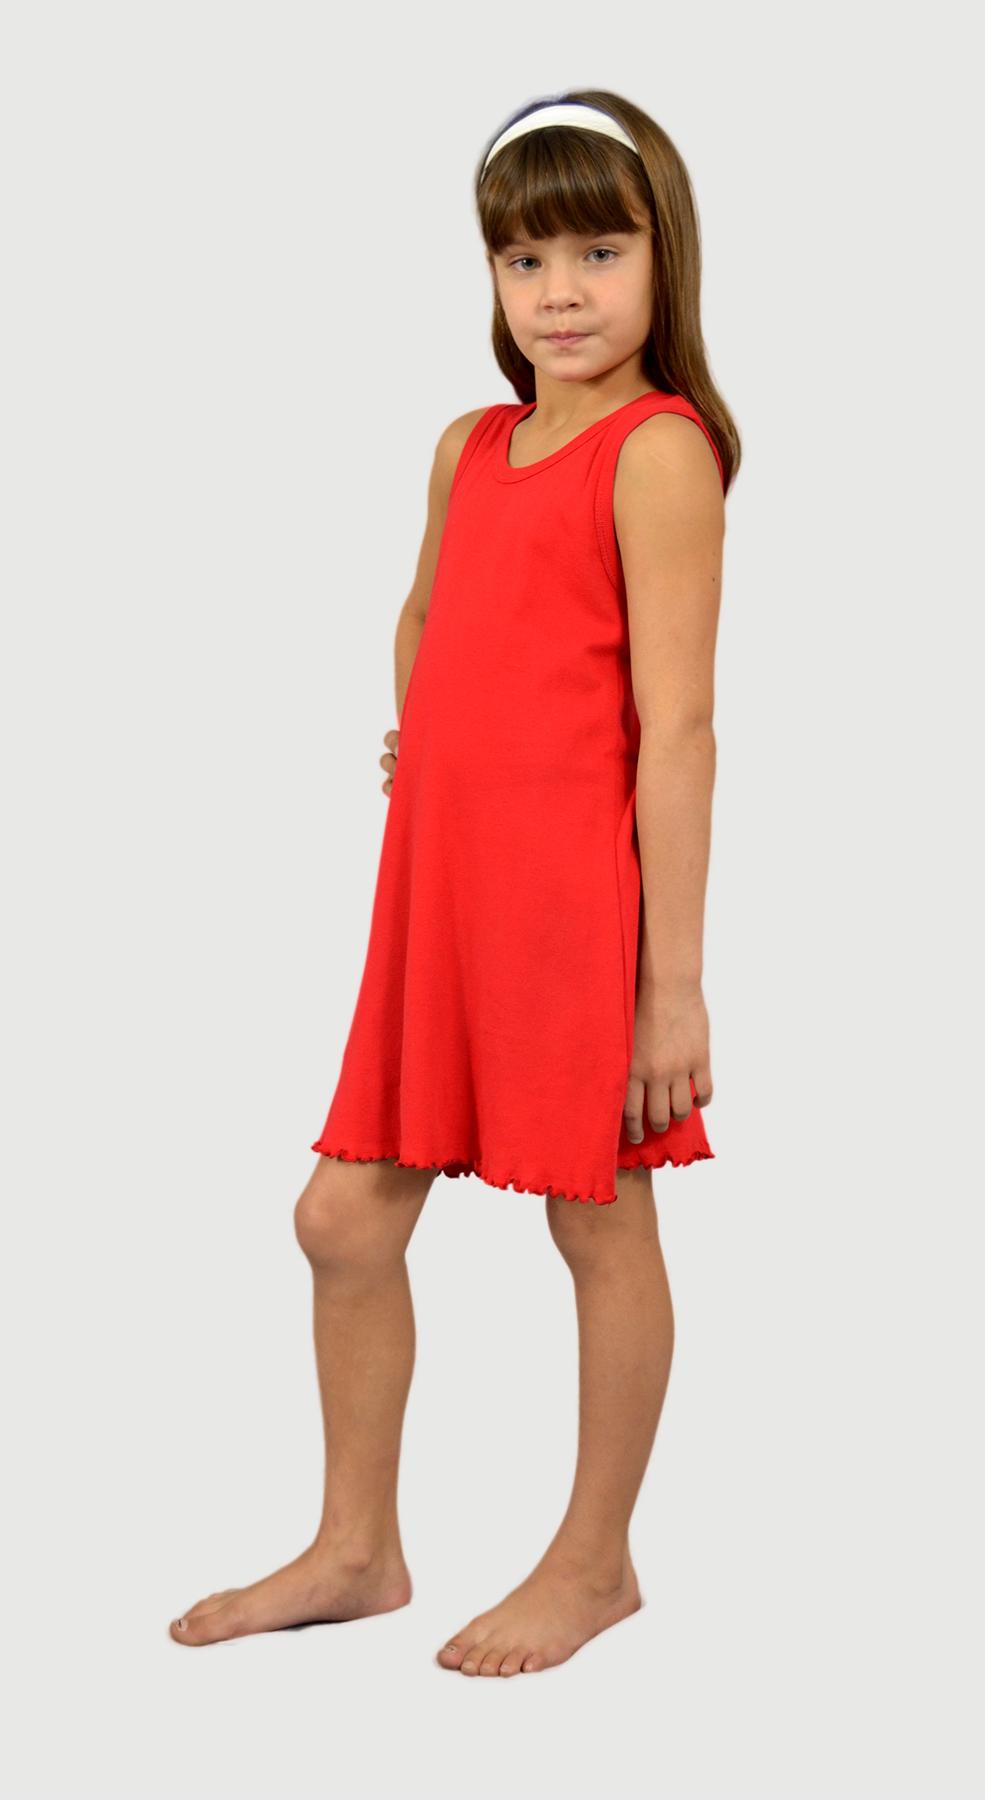 Monag 402170 - Baby Rib Tank Dress